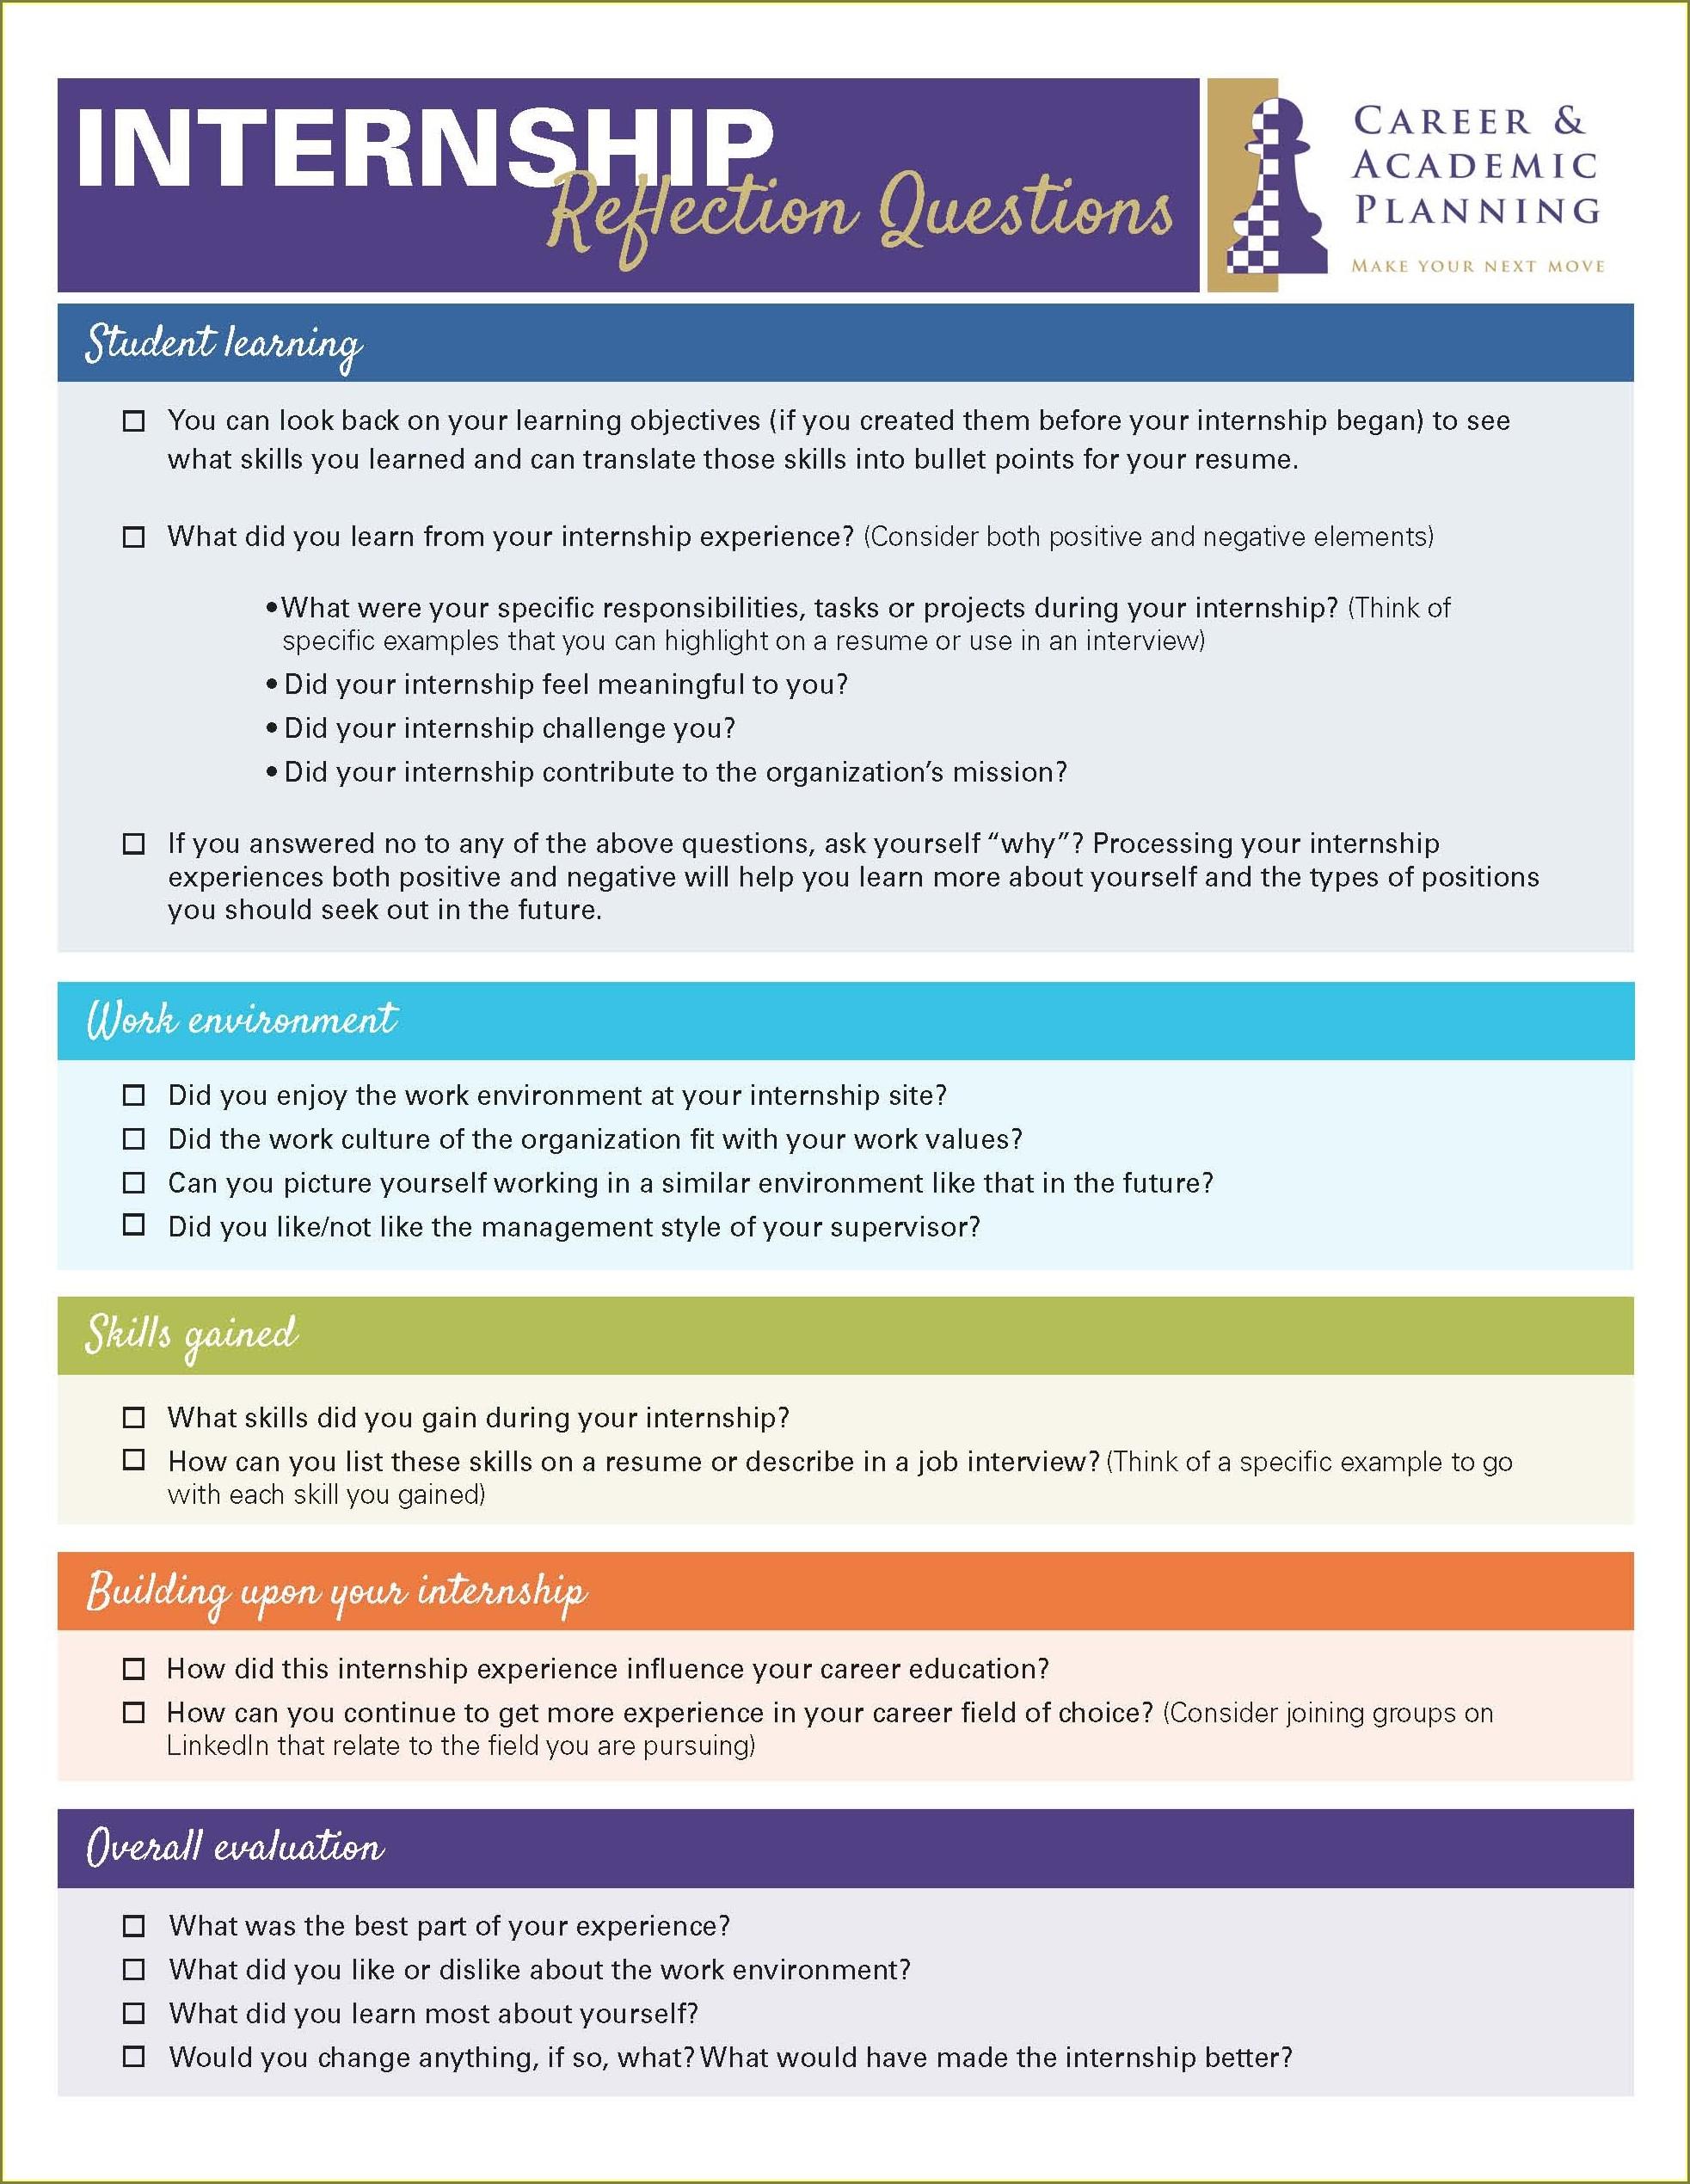 Internship Goal Setting Worksheet